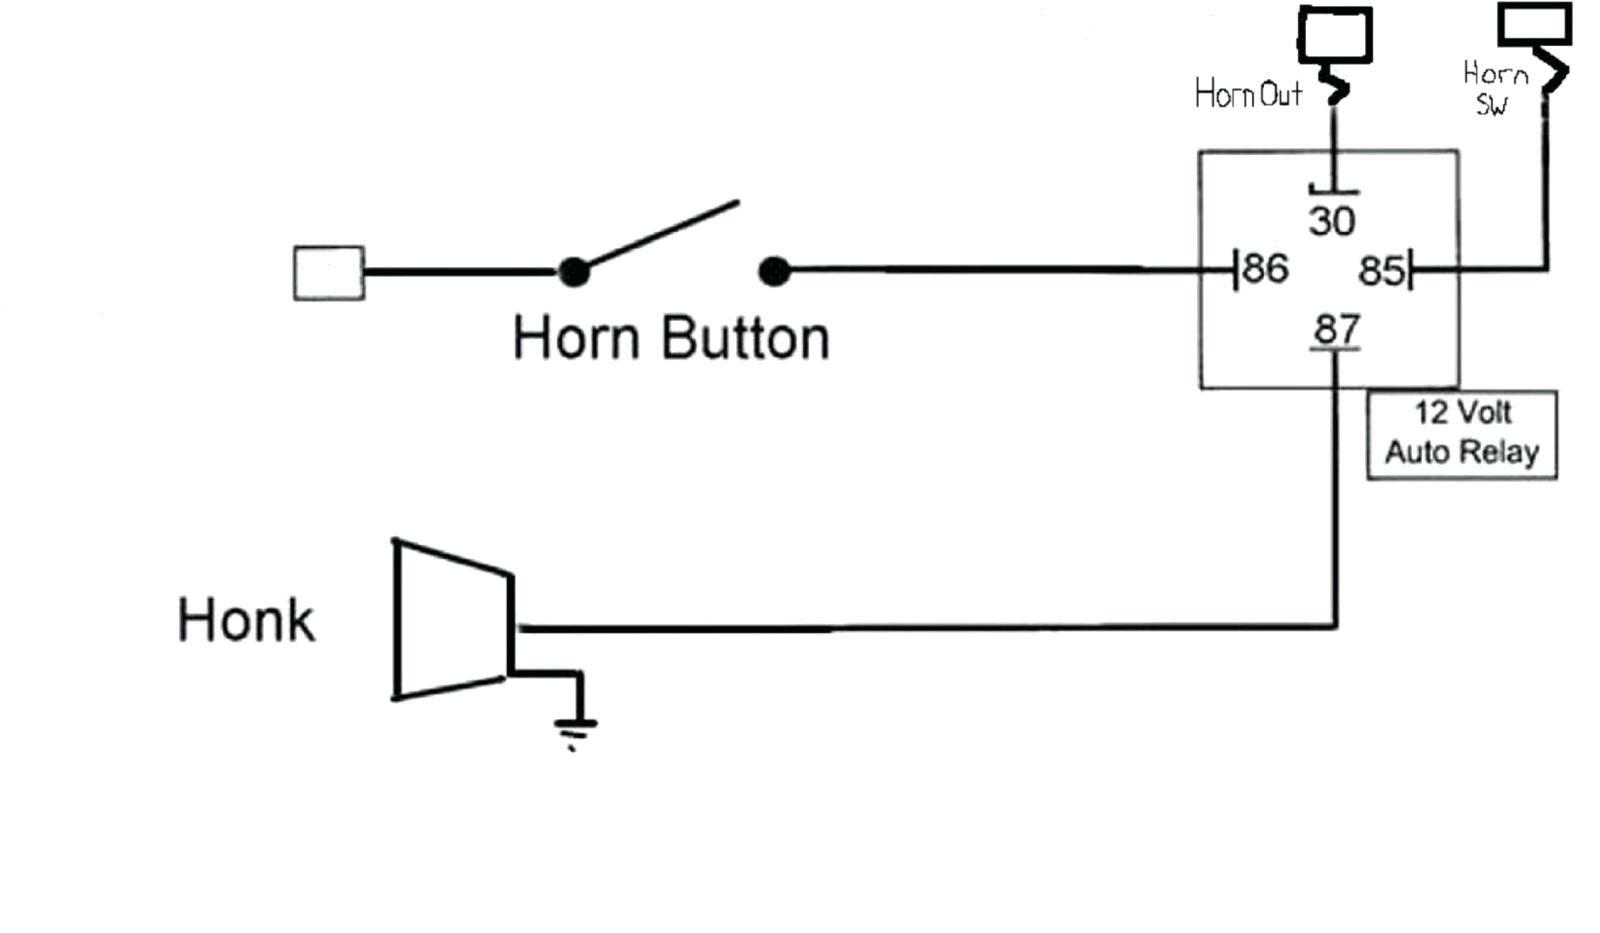 12v Horn Relay Wiring Diagram